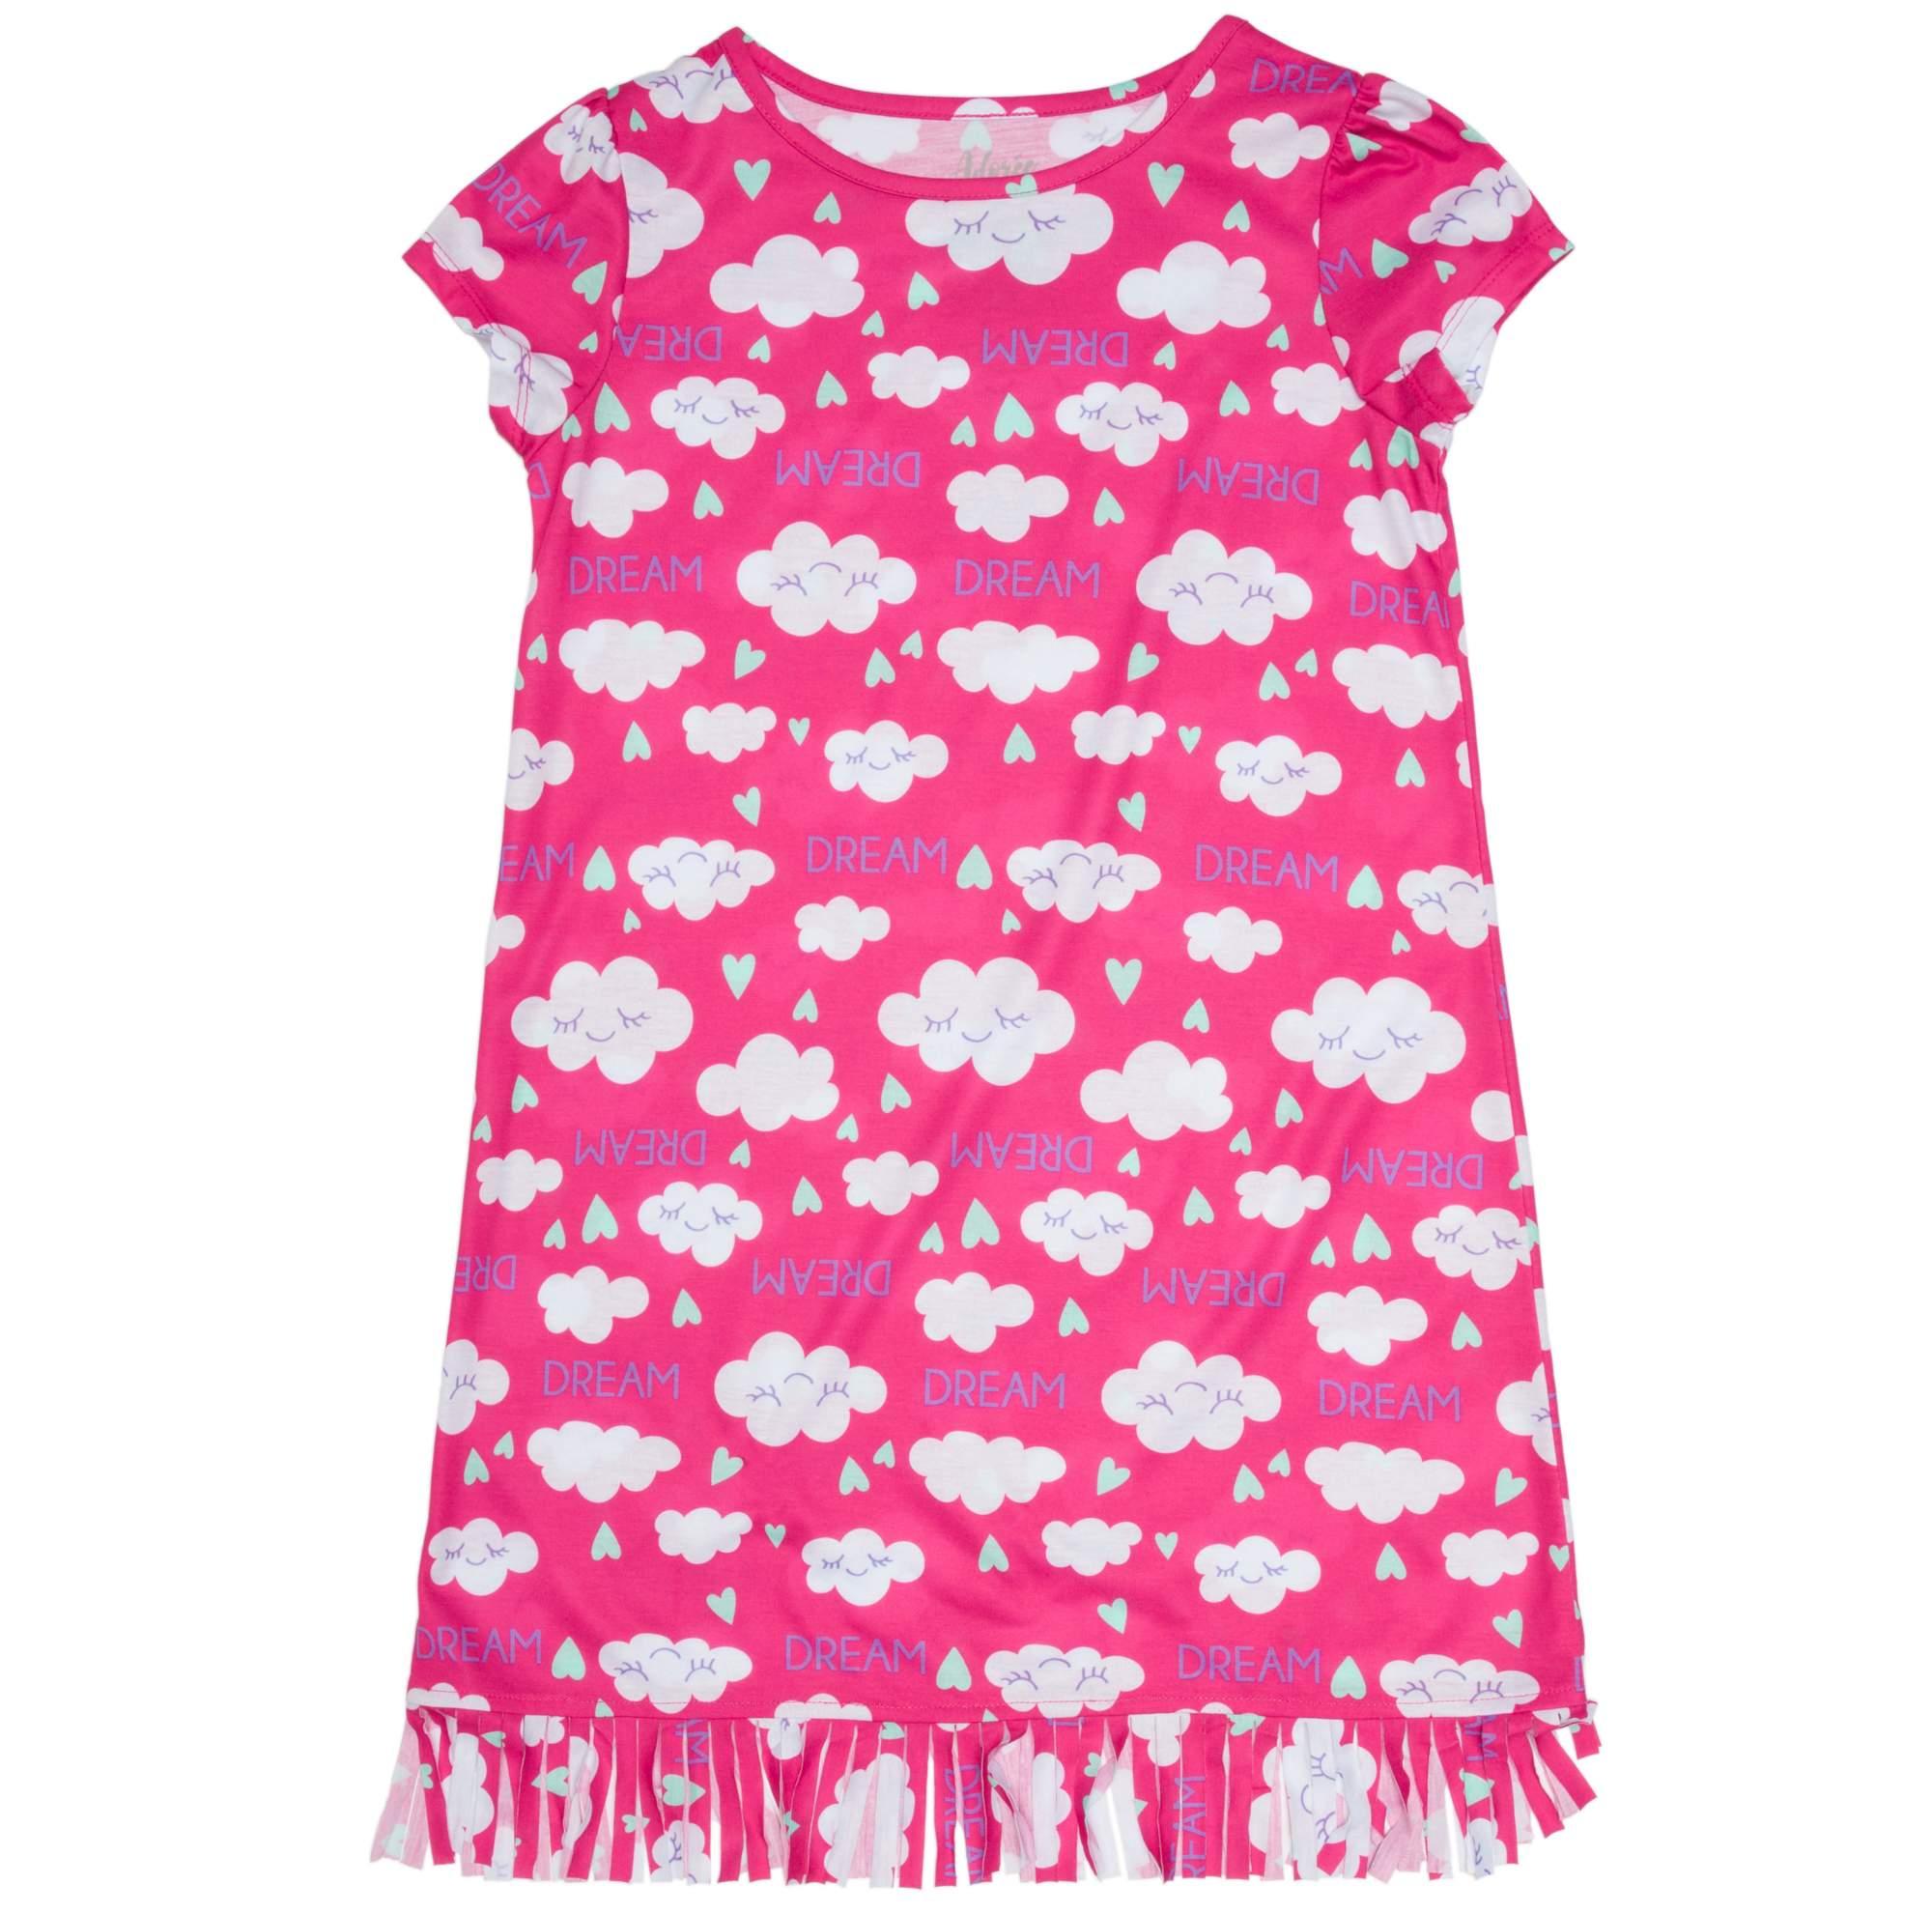 Image of Girl's Cloud Print Graphic Sleep Shirt with Fringe